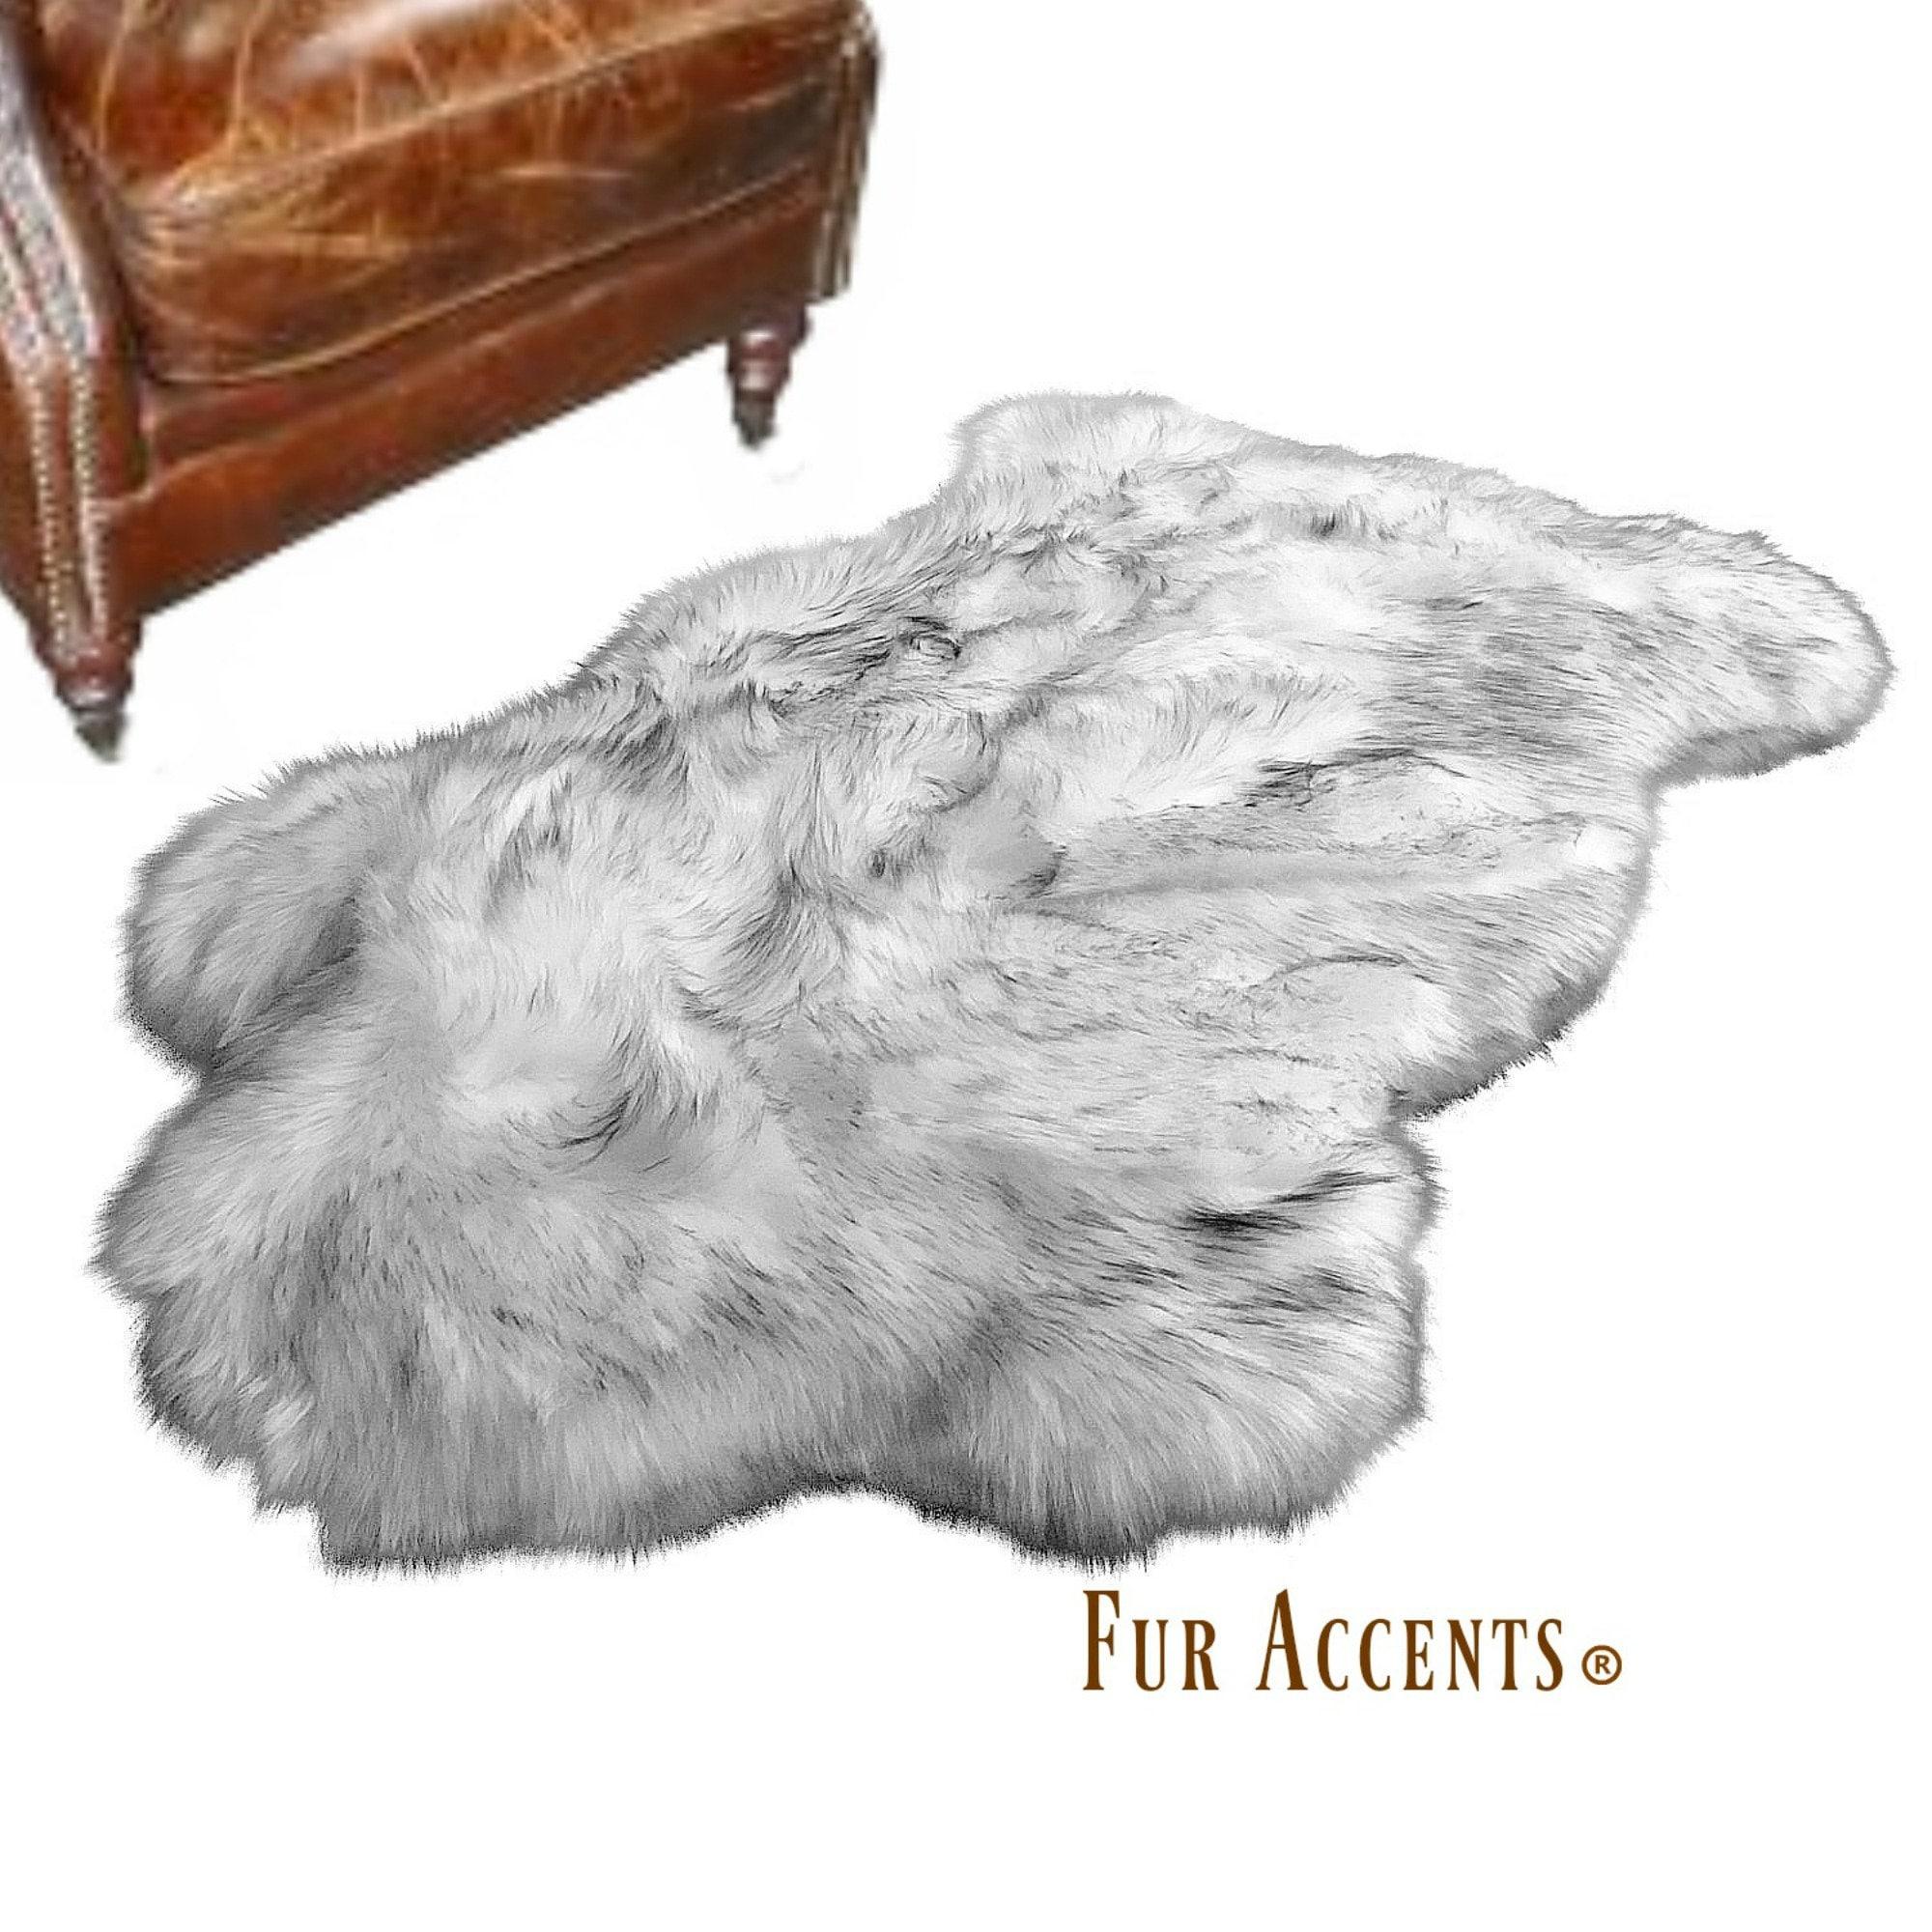 FUR ACCENTS Shaggy Black Sheepskin Area Rug  All Sizes